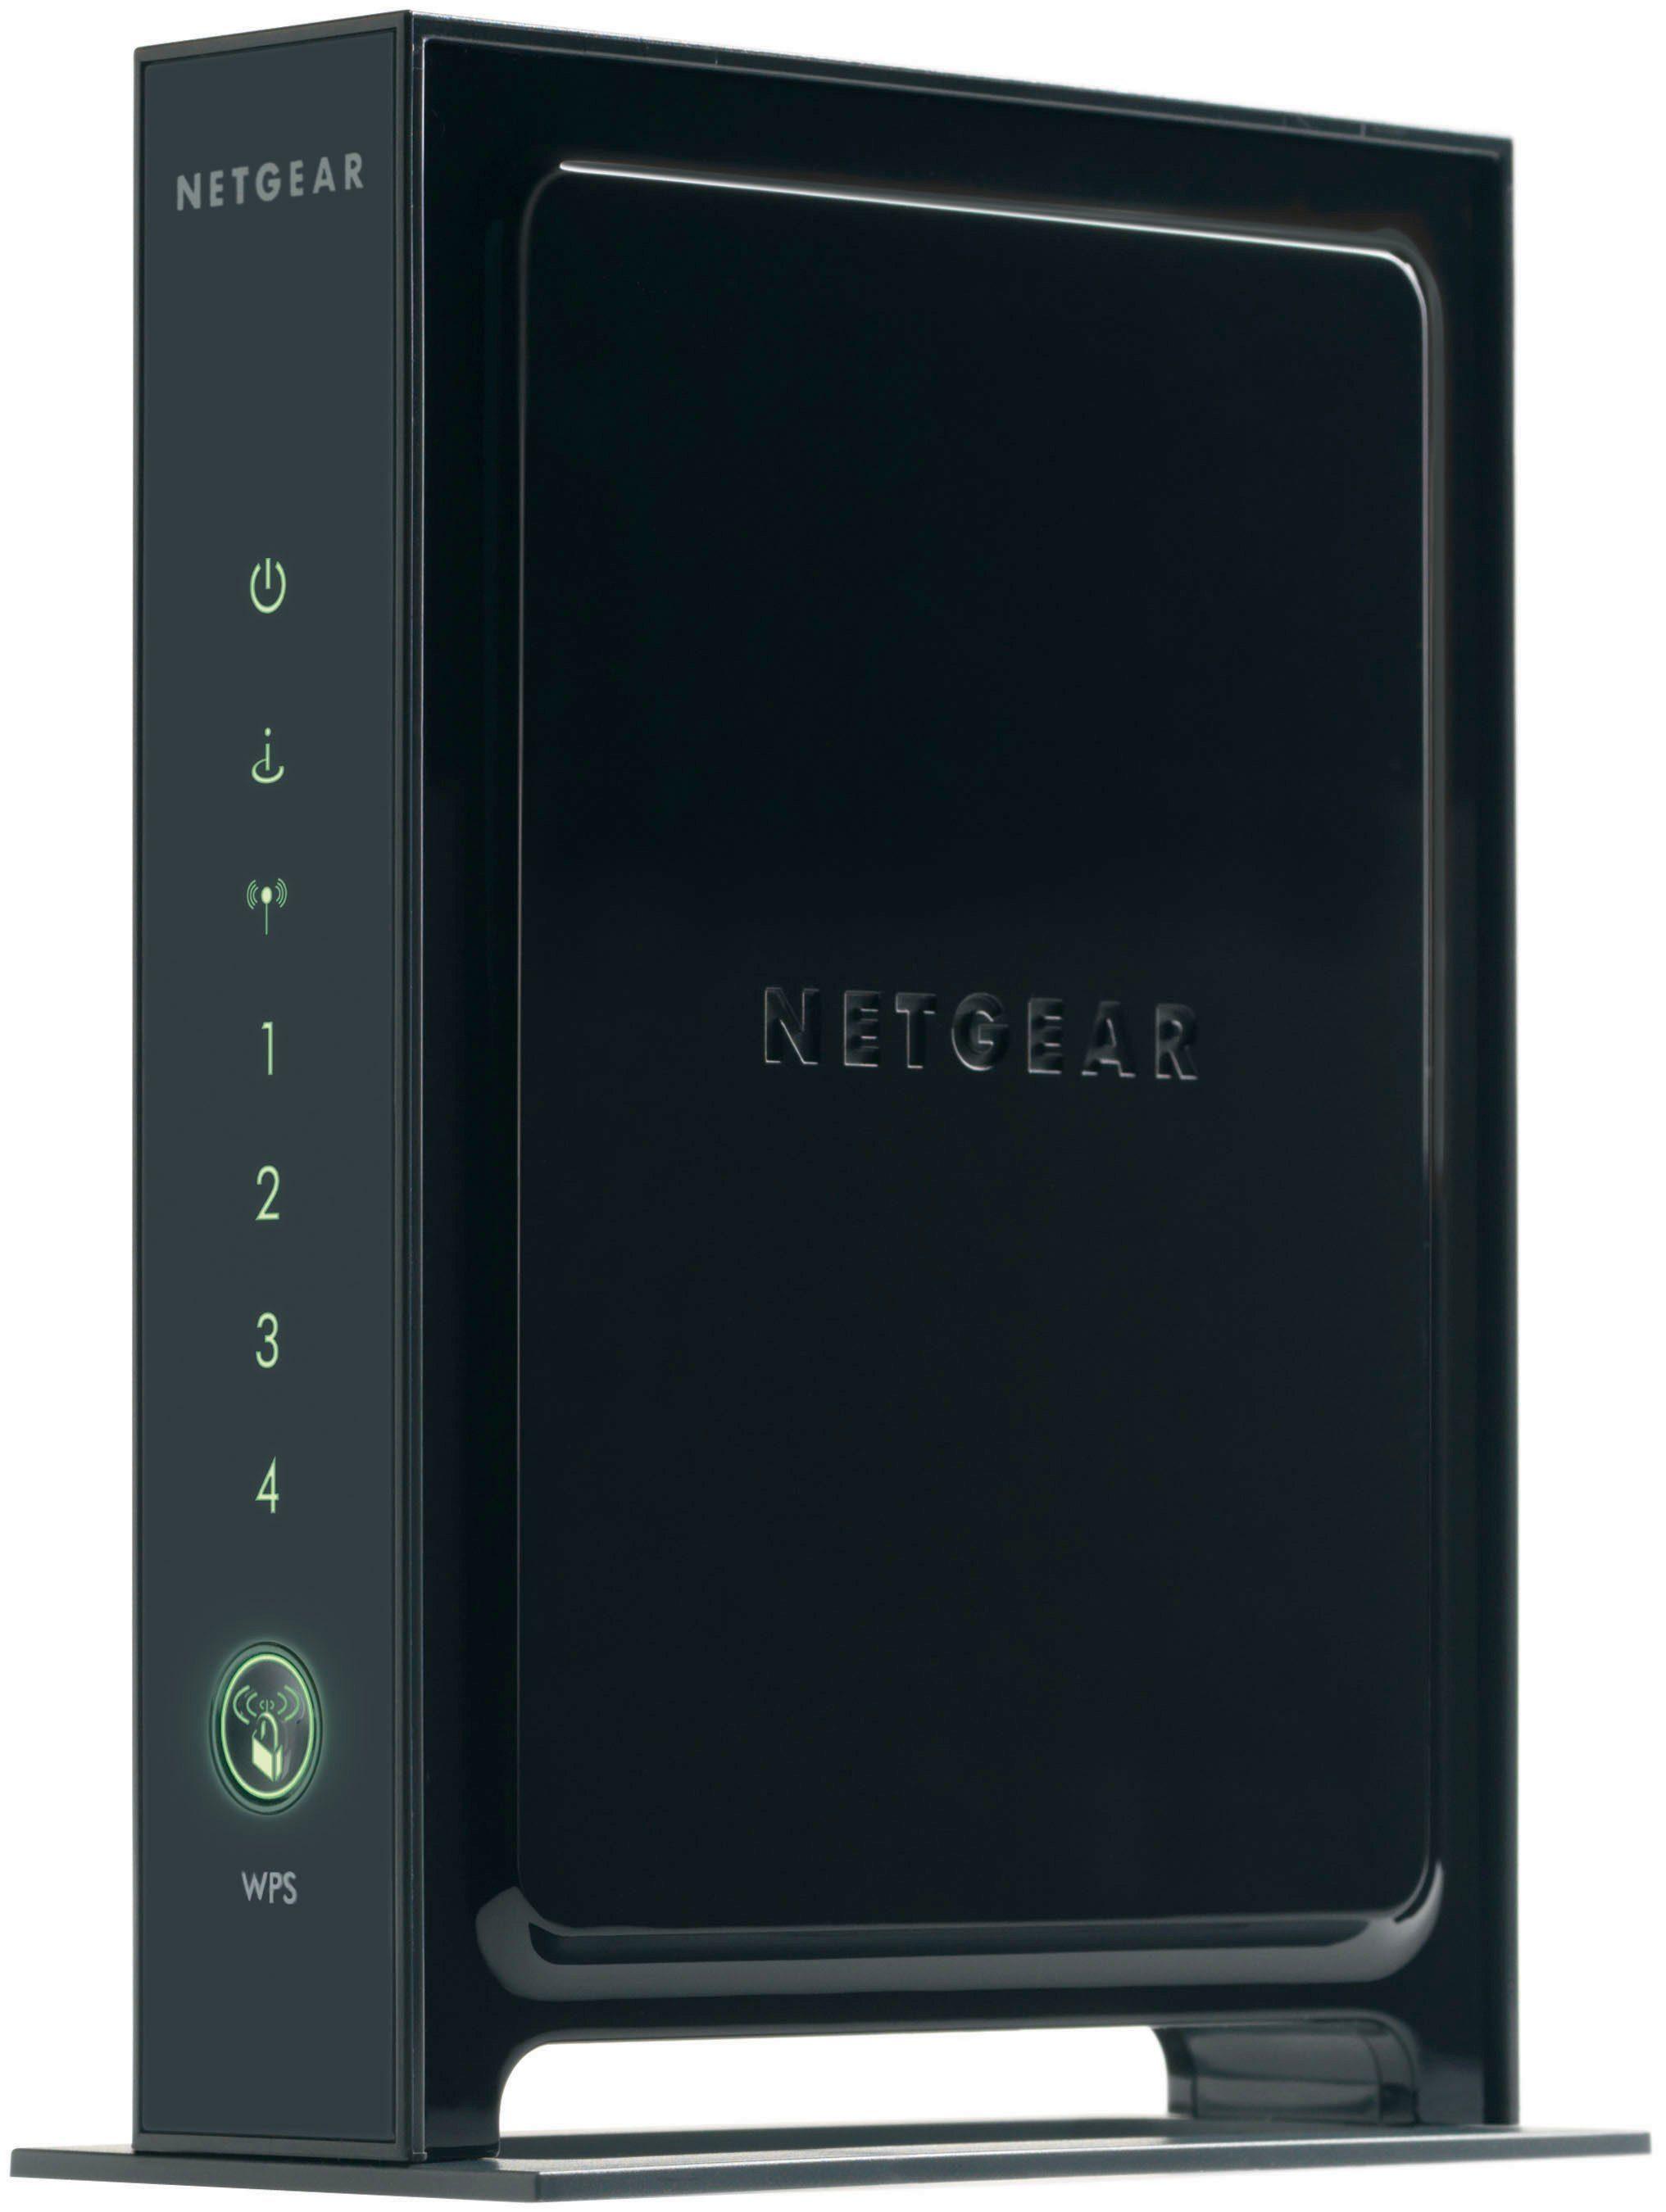 Netgear Router »N300 WLAN Router 4x LAN-Ports«